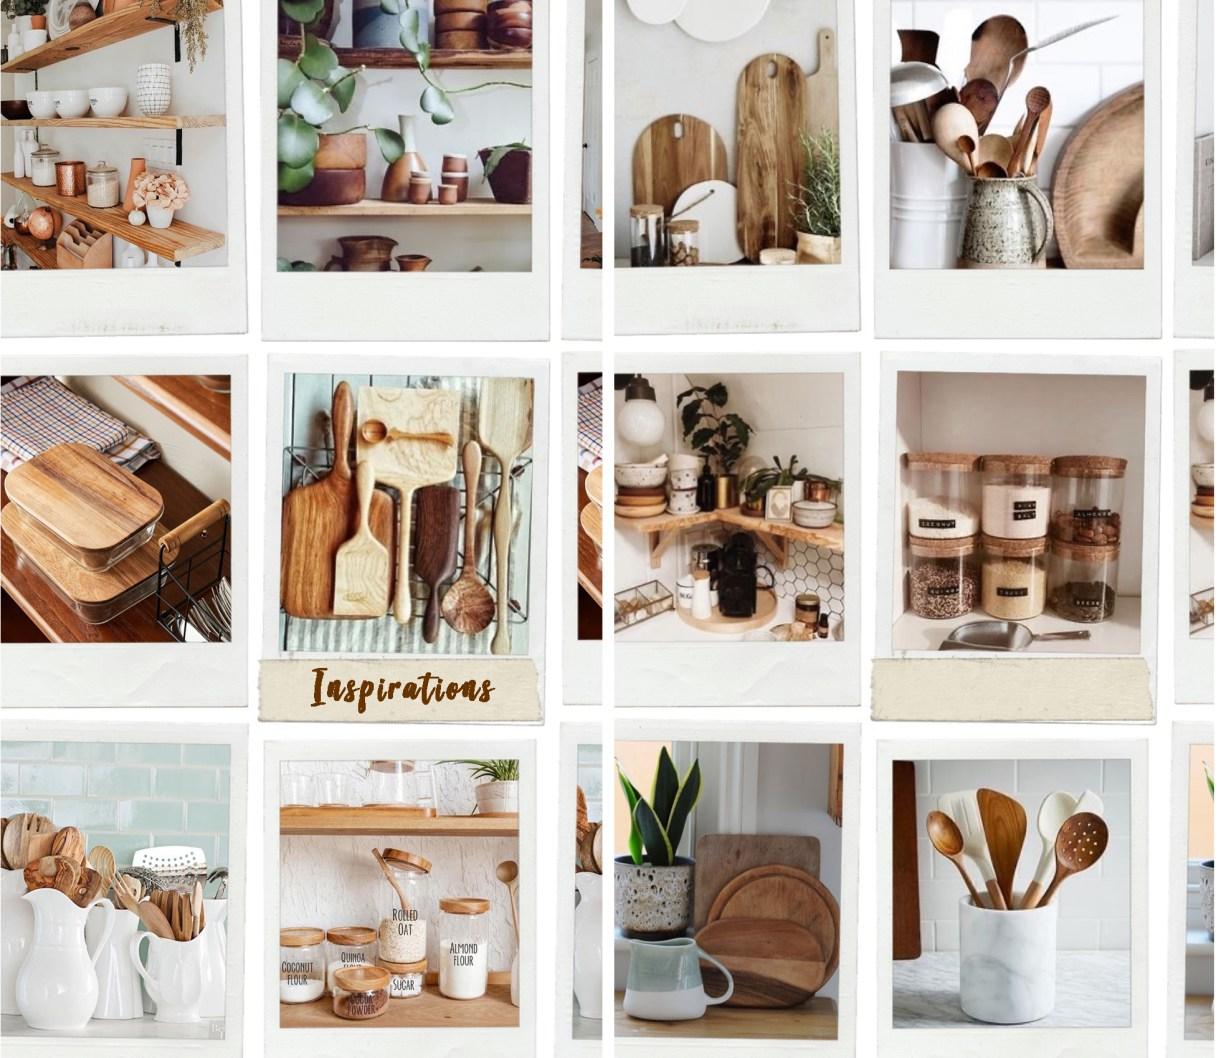 cuisine, vaisselle, ustensiles bois, bois marbre